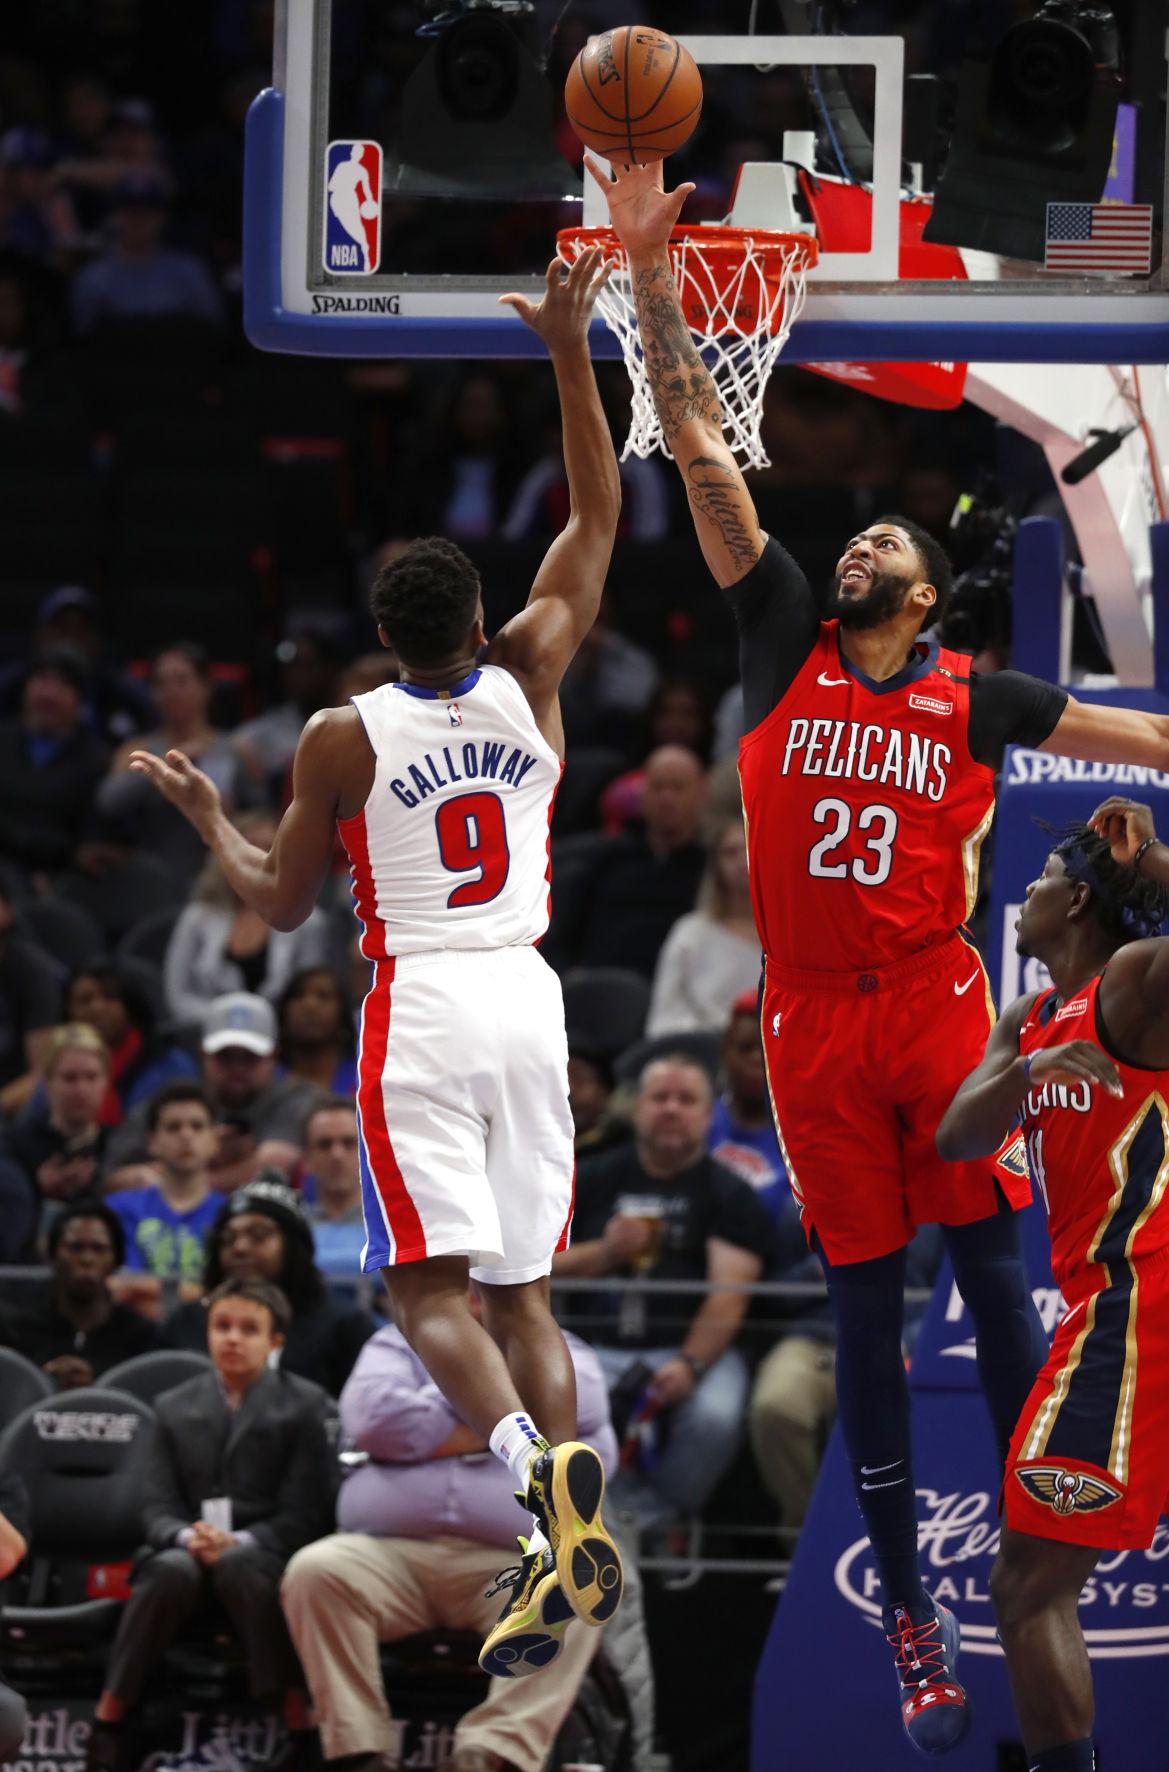 Pelicans Pistons Basketball